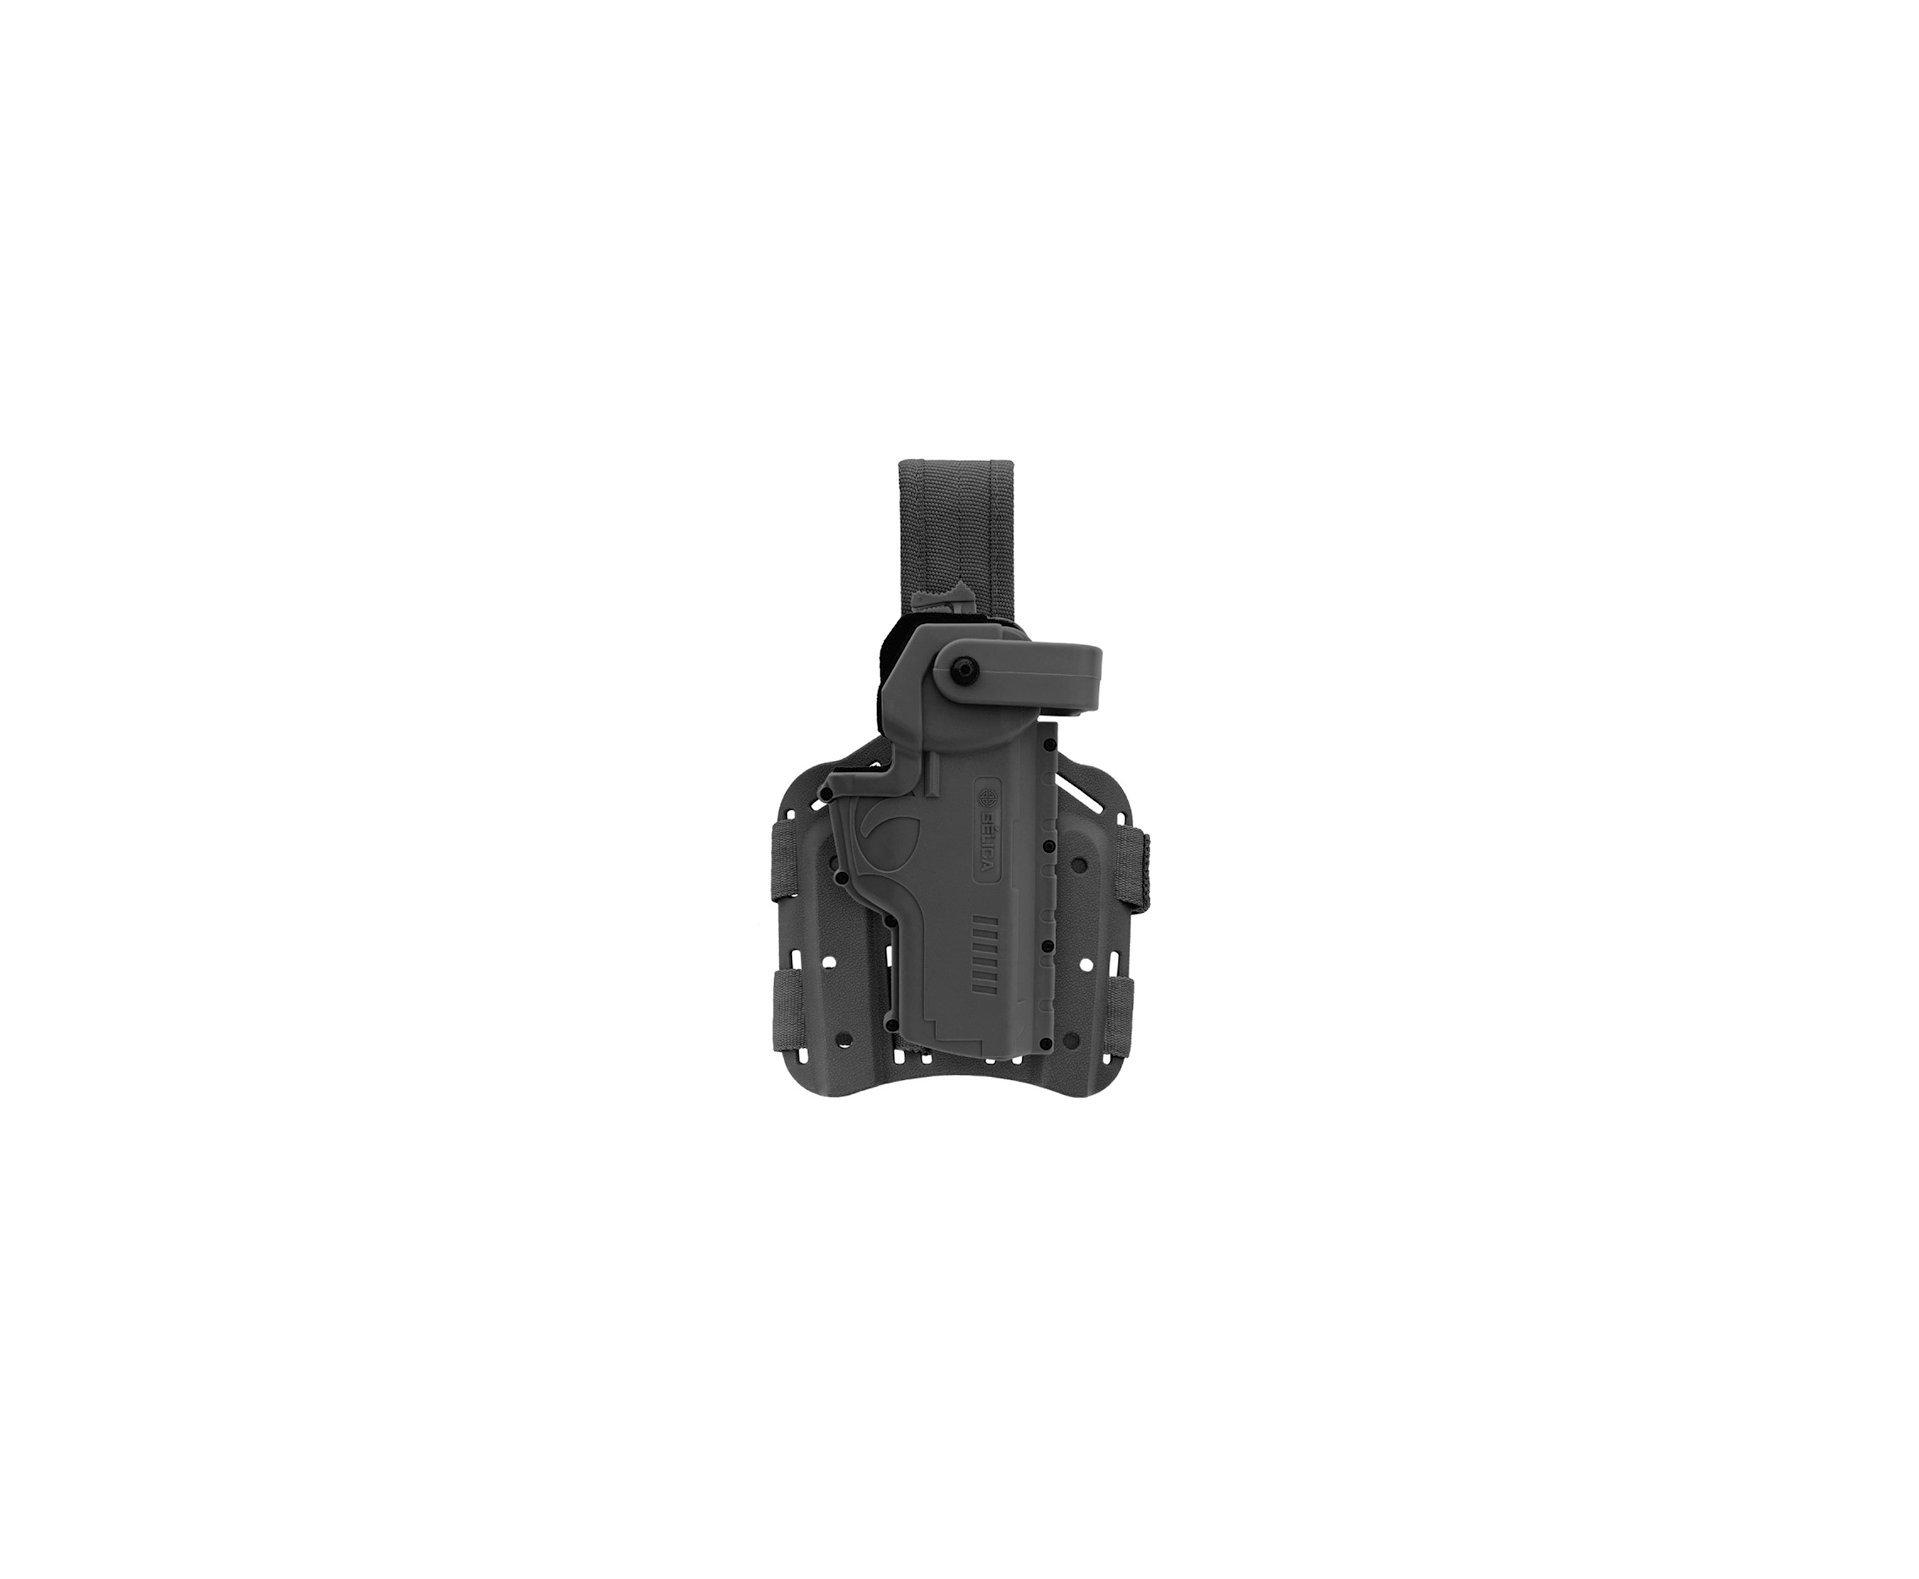 Coldre Hammer Ii De Coxa Em Polímero Pistolas Taurus, Glock, Imbel Destro - Belica